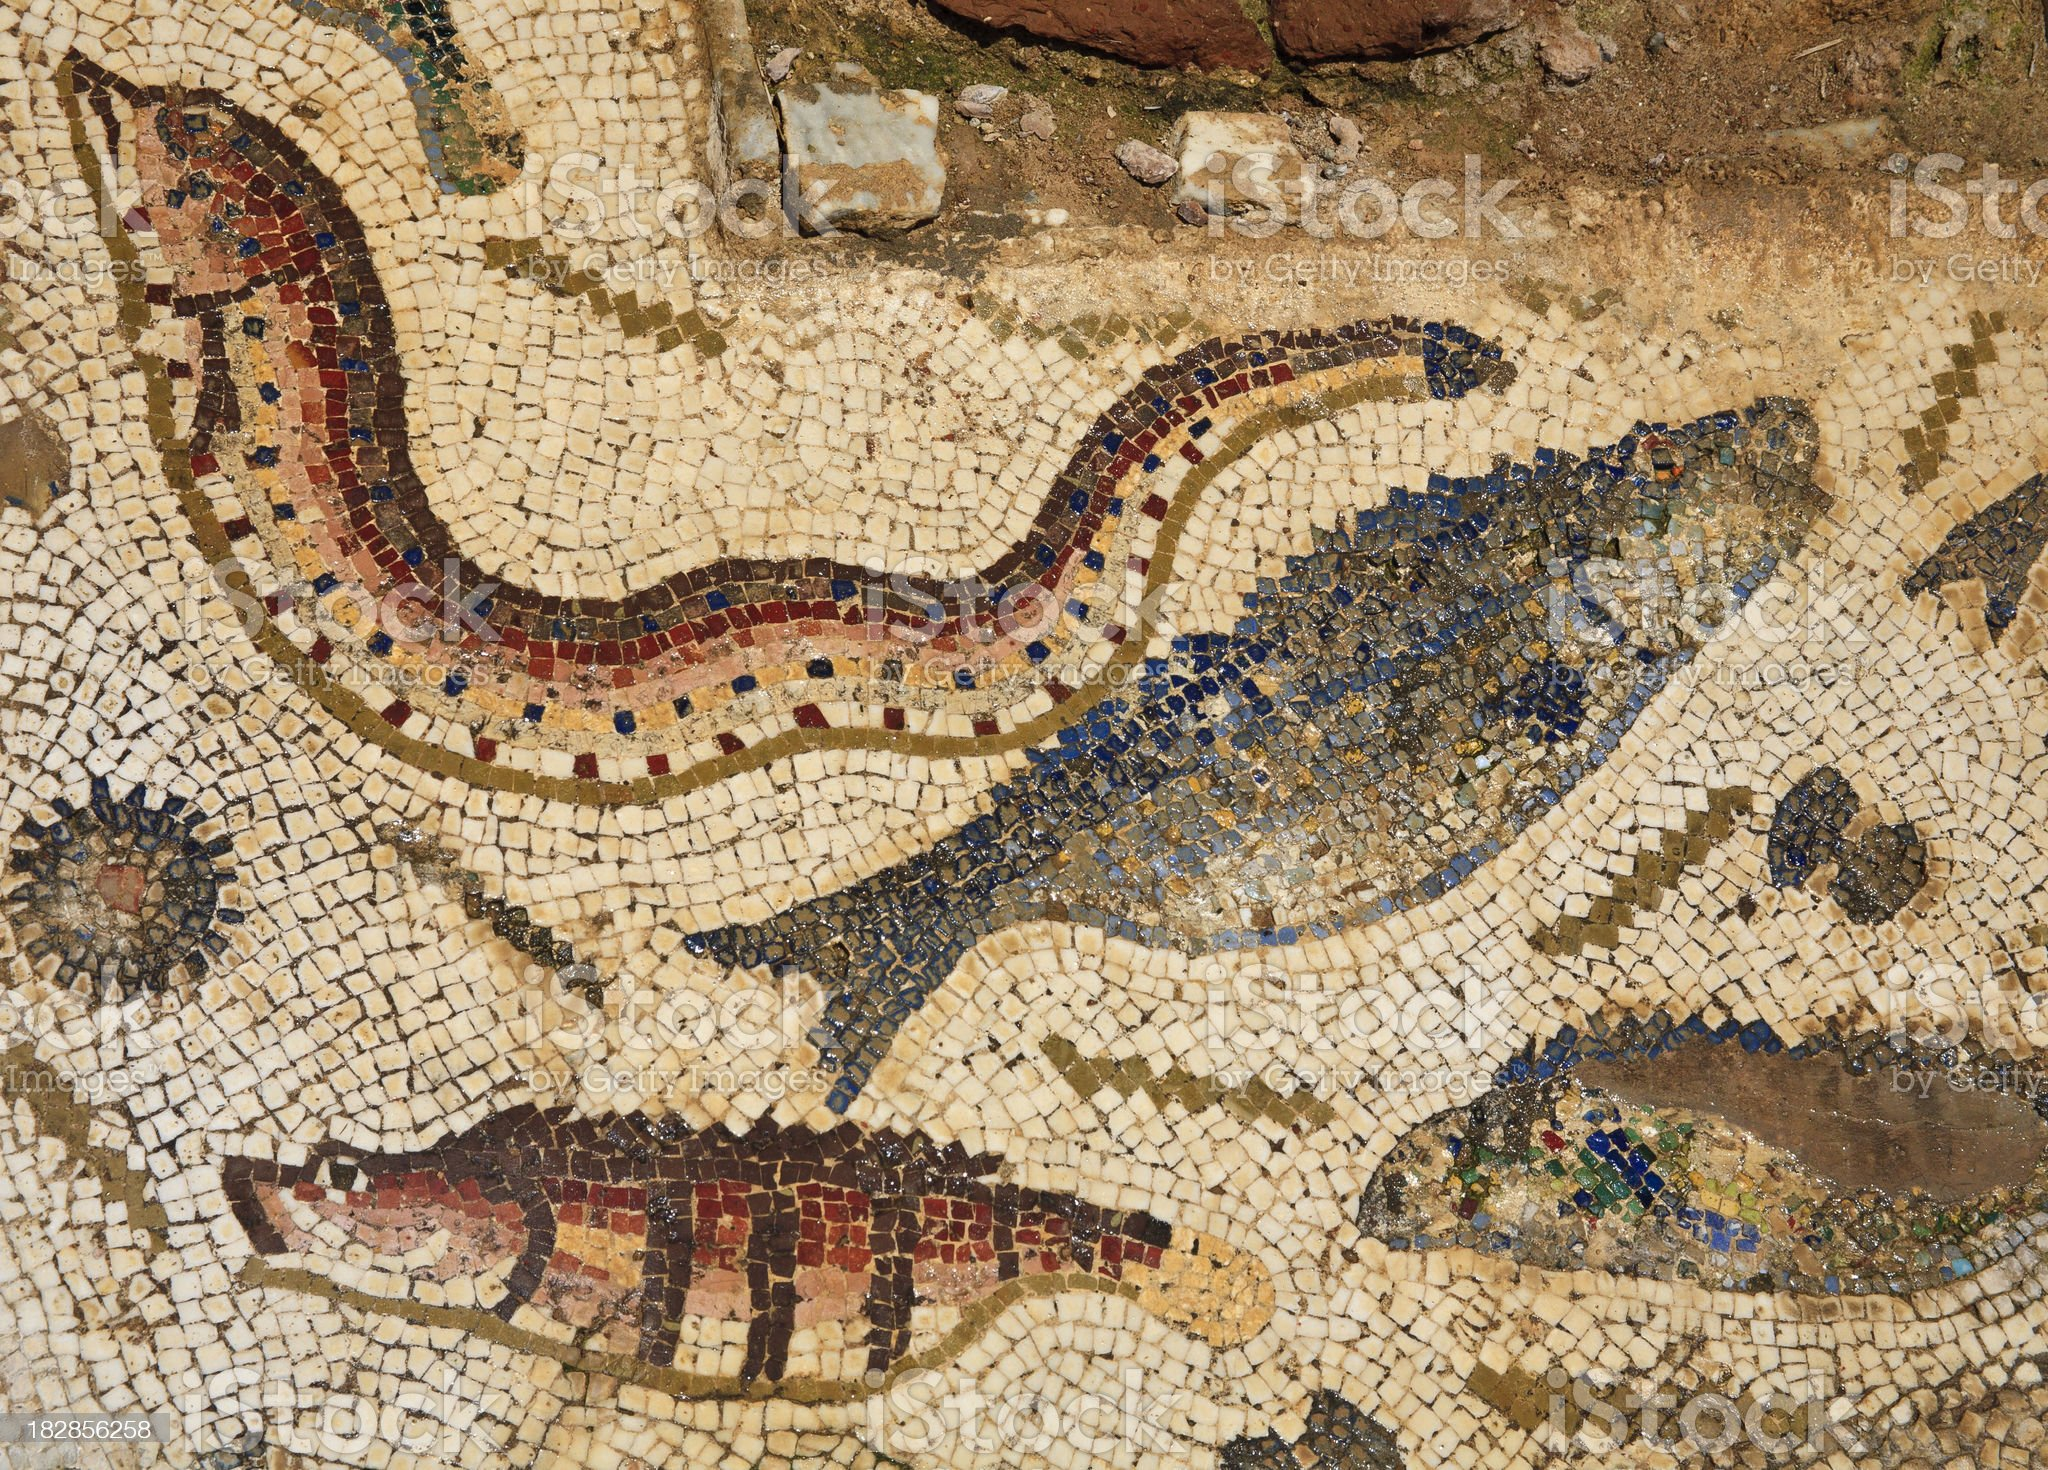 Tunisia: Mosiac Floor Detail at Utique  (Utica) Showing Fish royalty-free stock photo